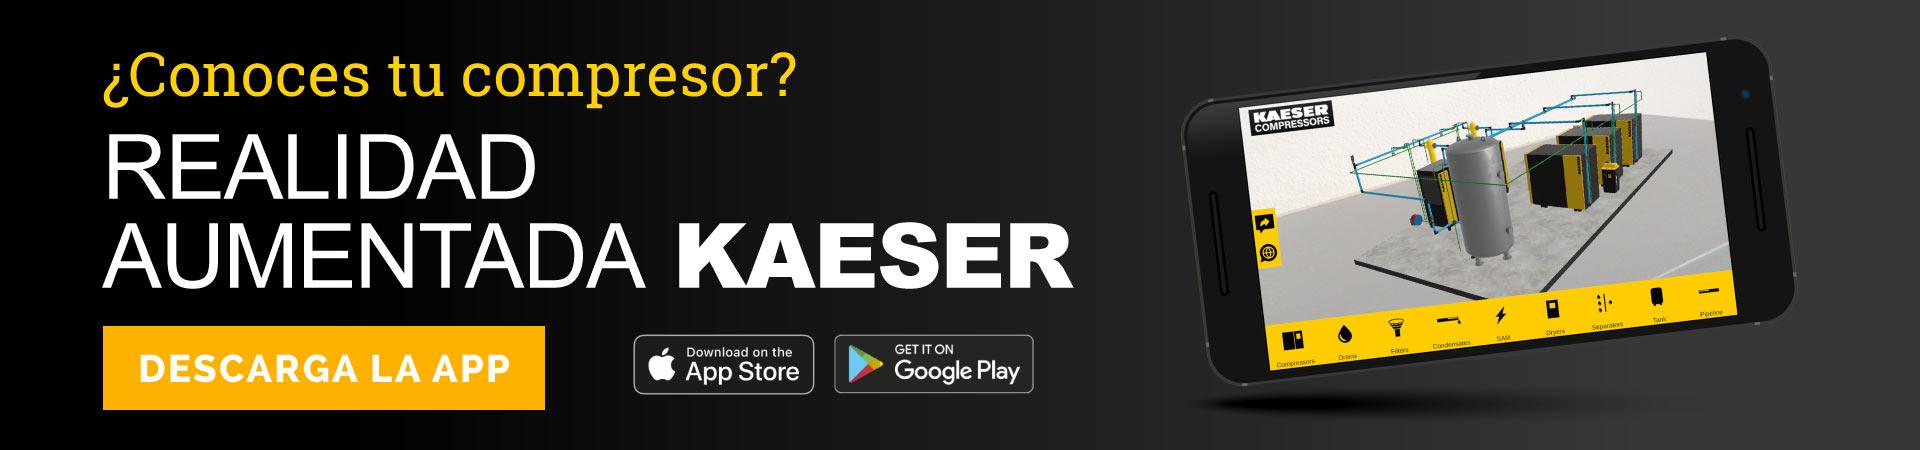 banner-app-kaeser-yunfer-3d-realidad-aumentada